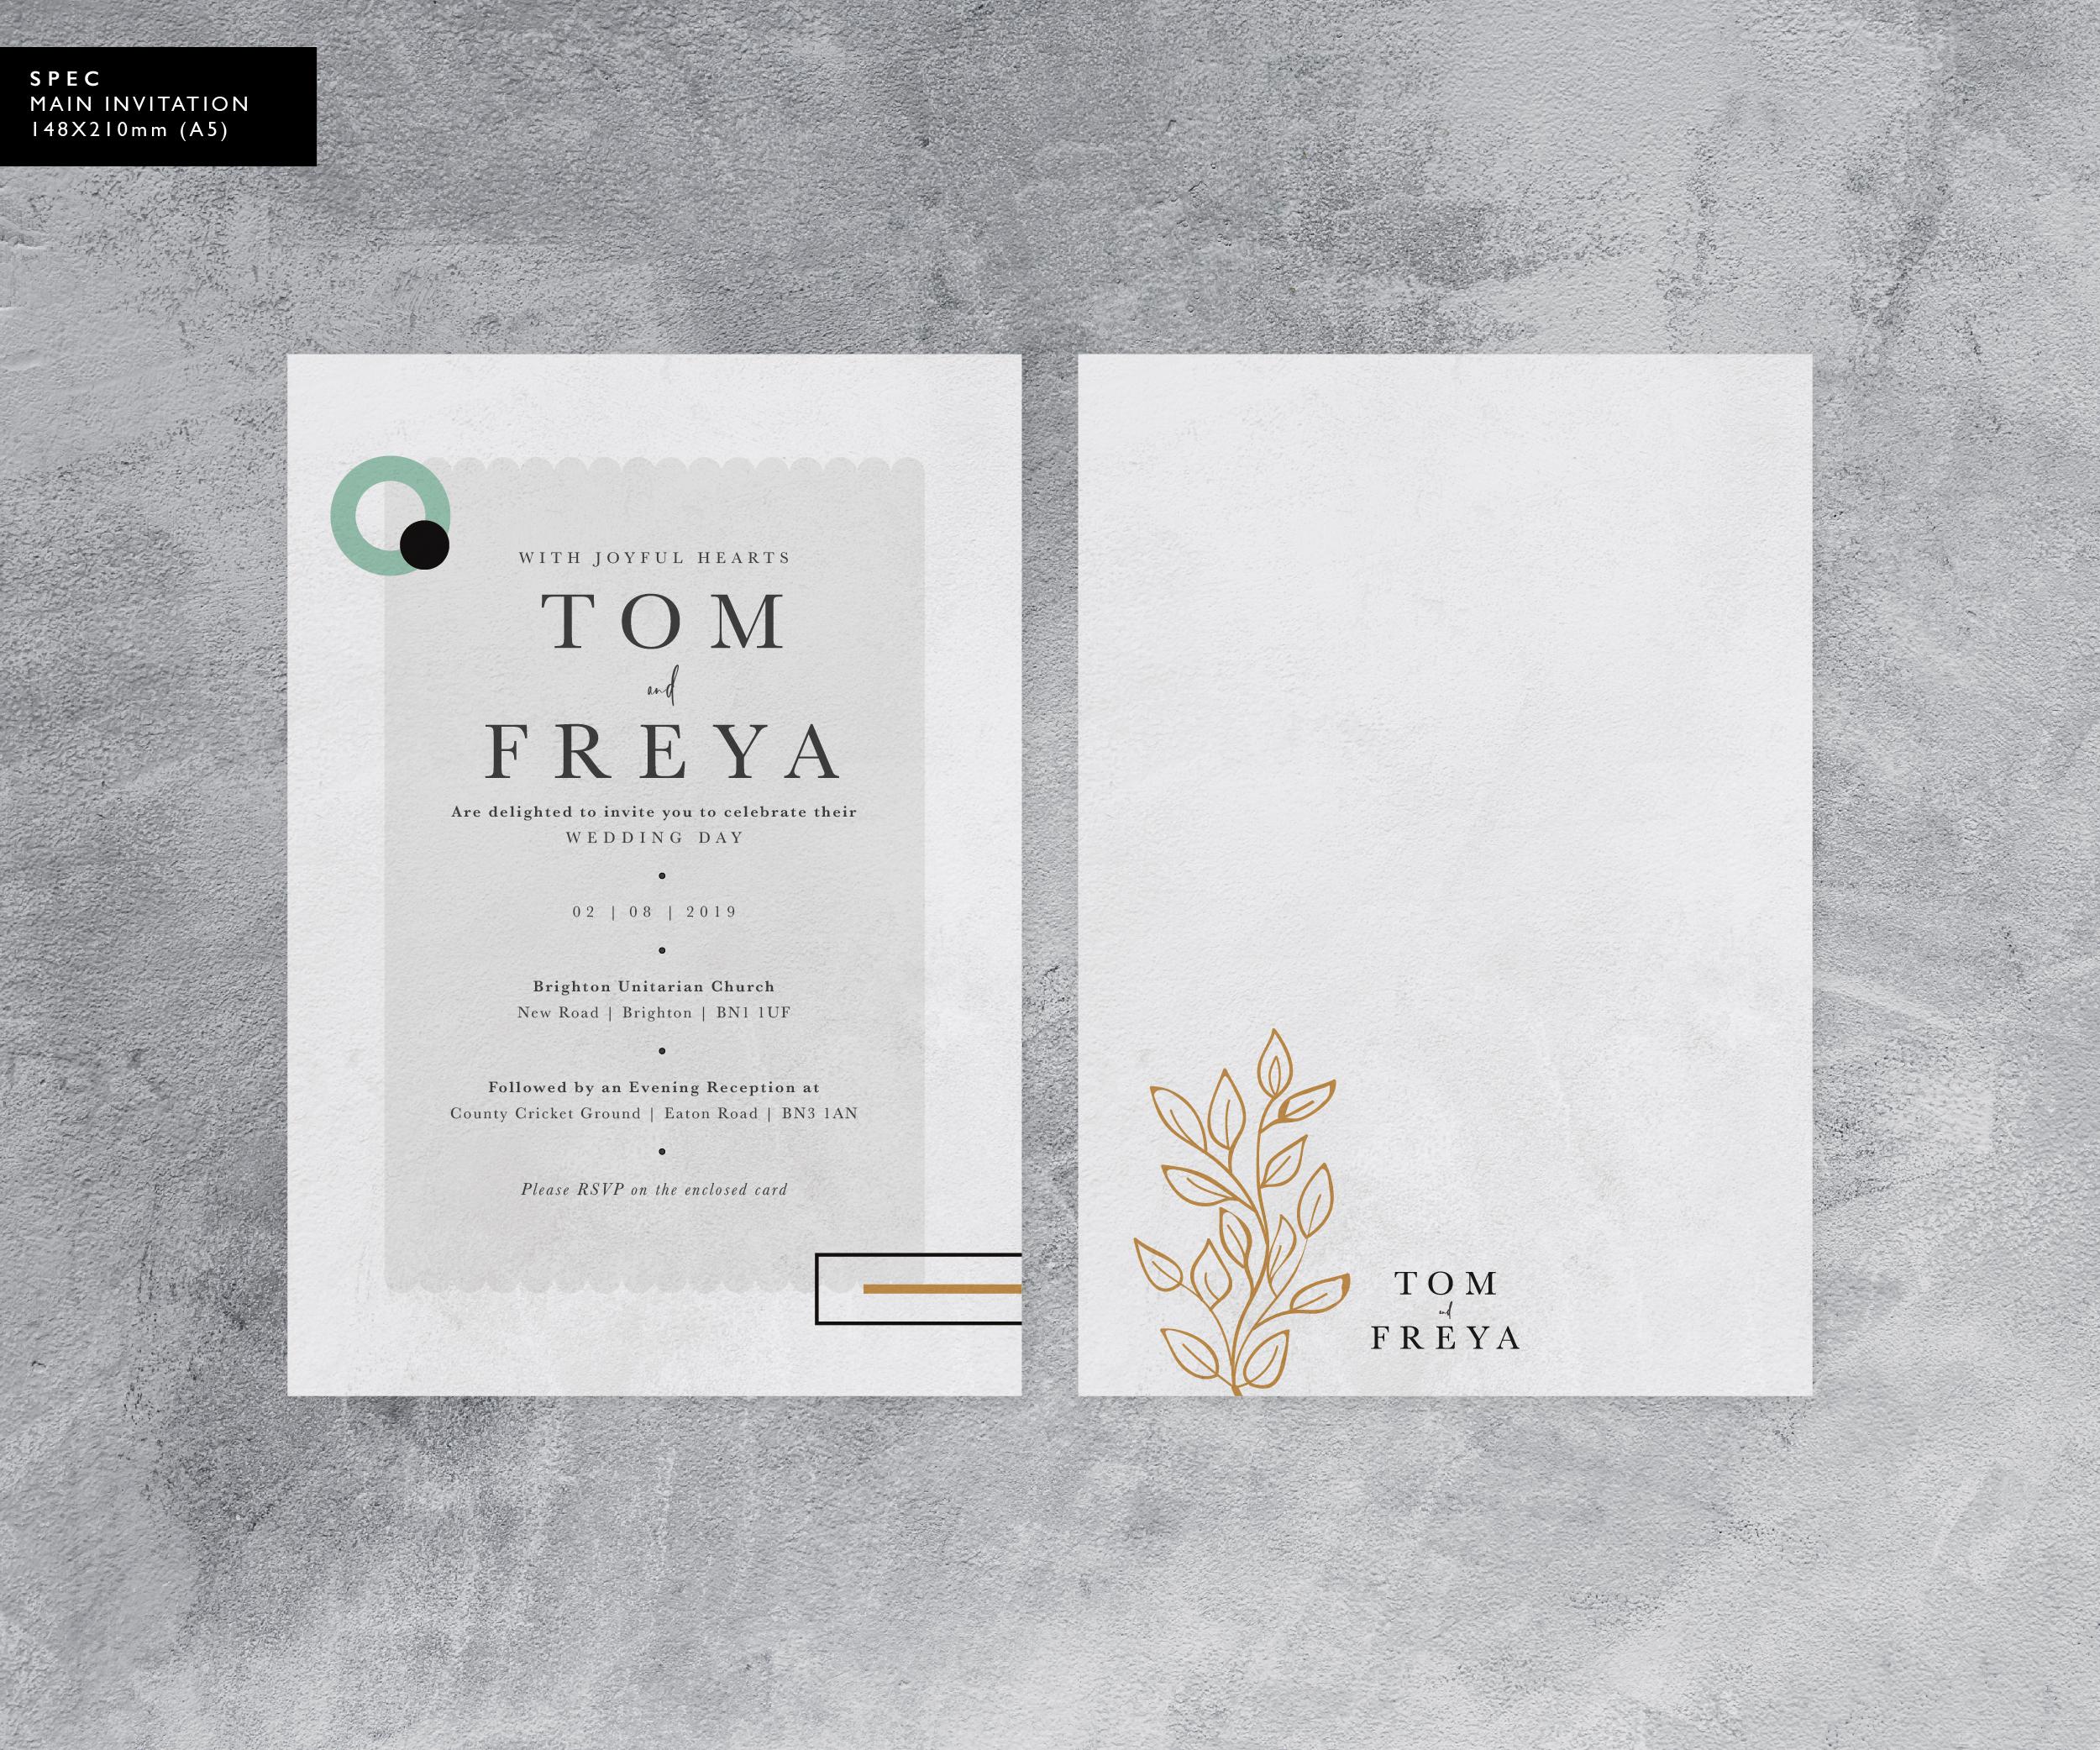 Freya_Wedding_Invitation_Template_9.jpg